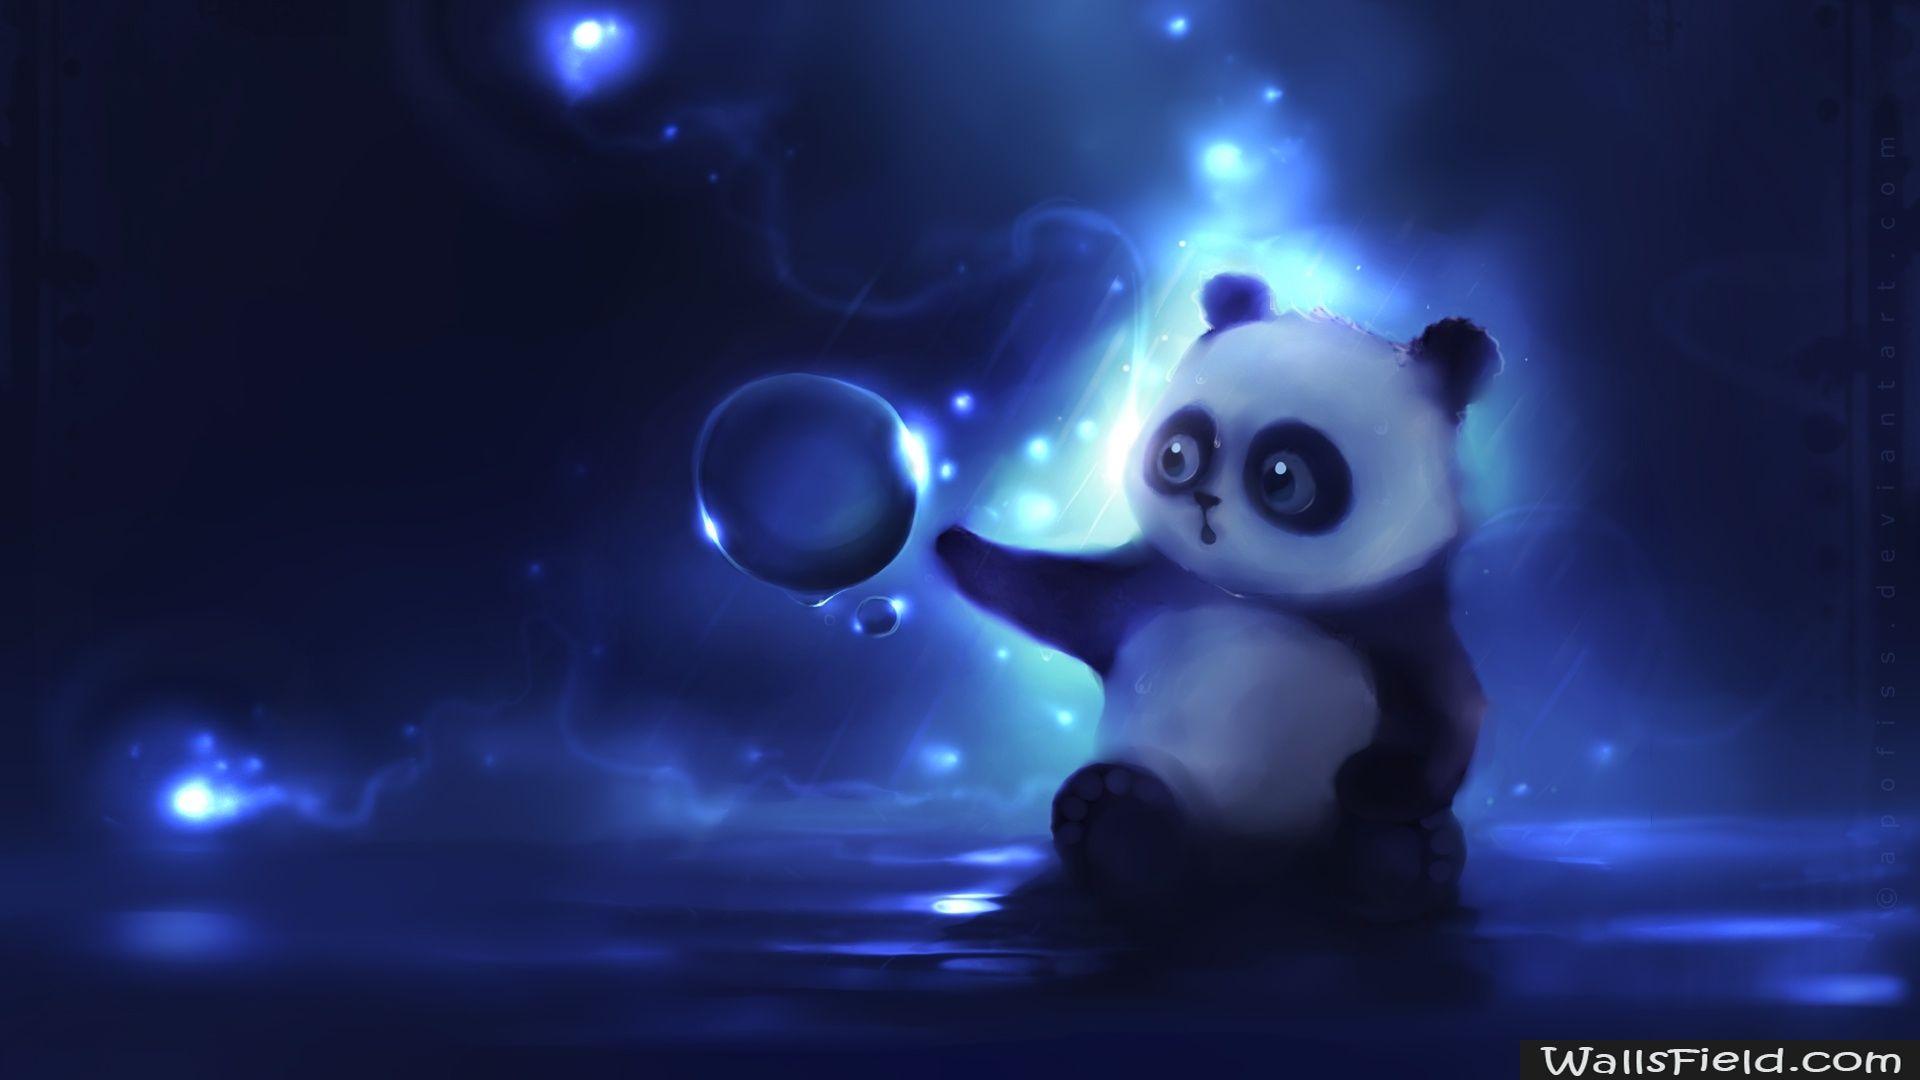 Curious Panda Painting Llustrat Ons Oboi Illyustracii Kartinki